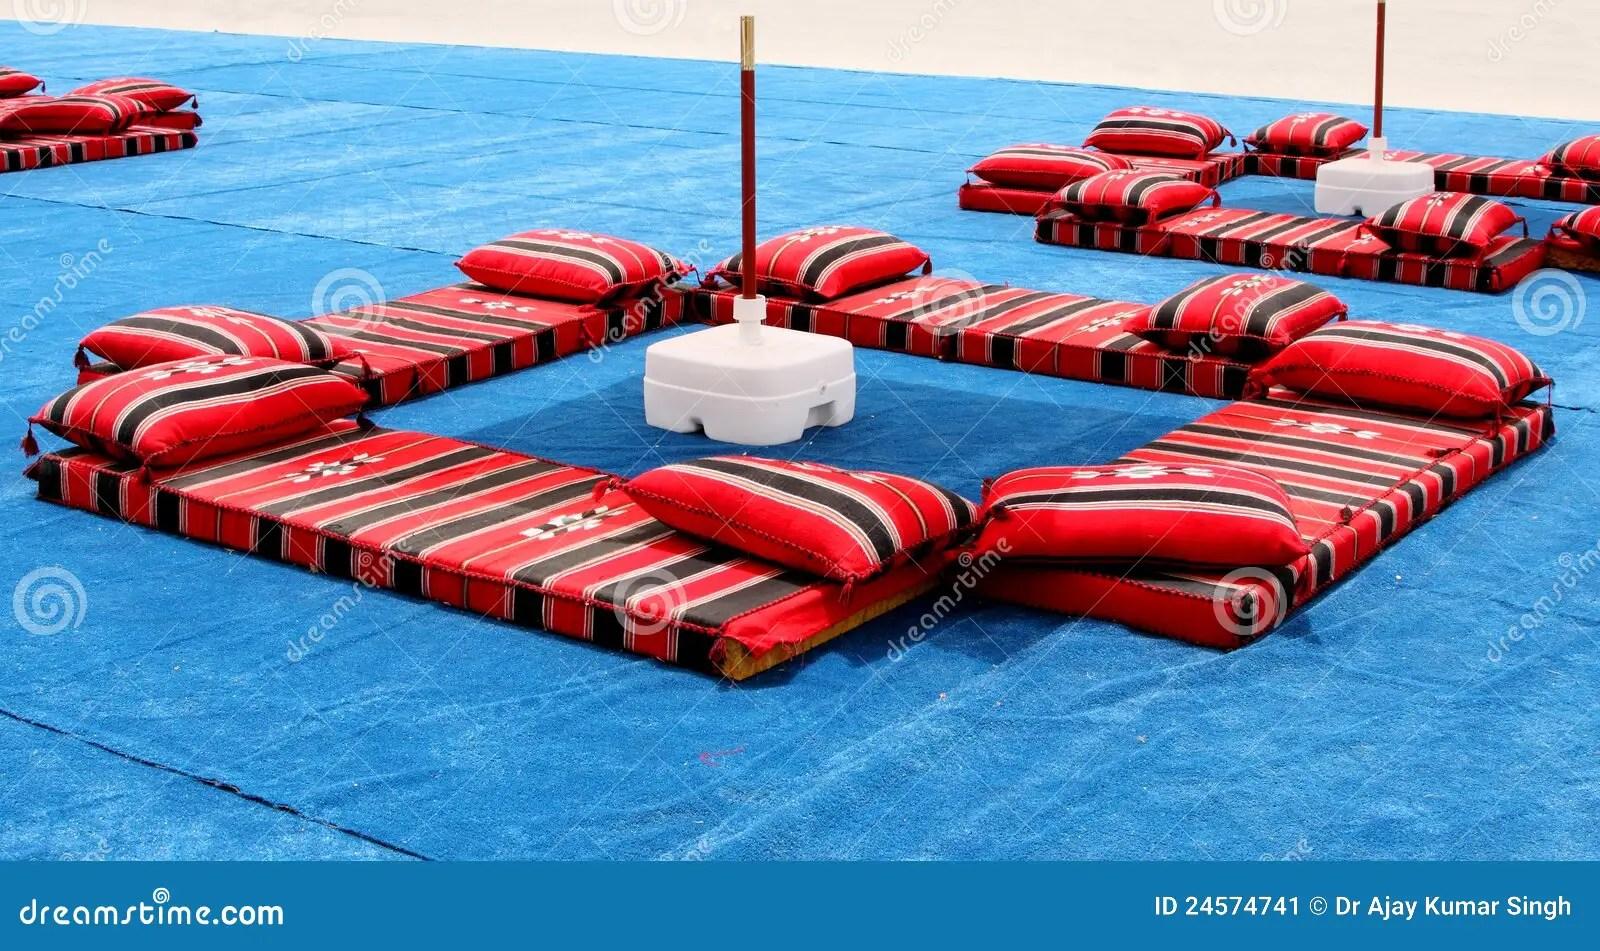 Majlis Traditional Colourful Arabian Seating Stock Image